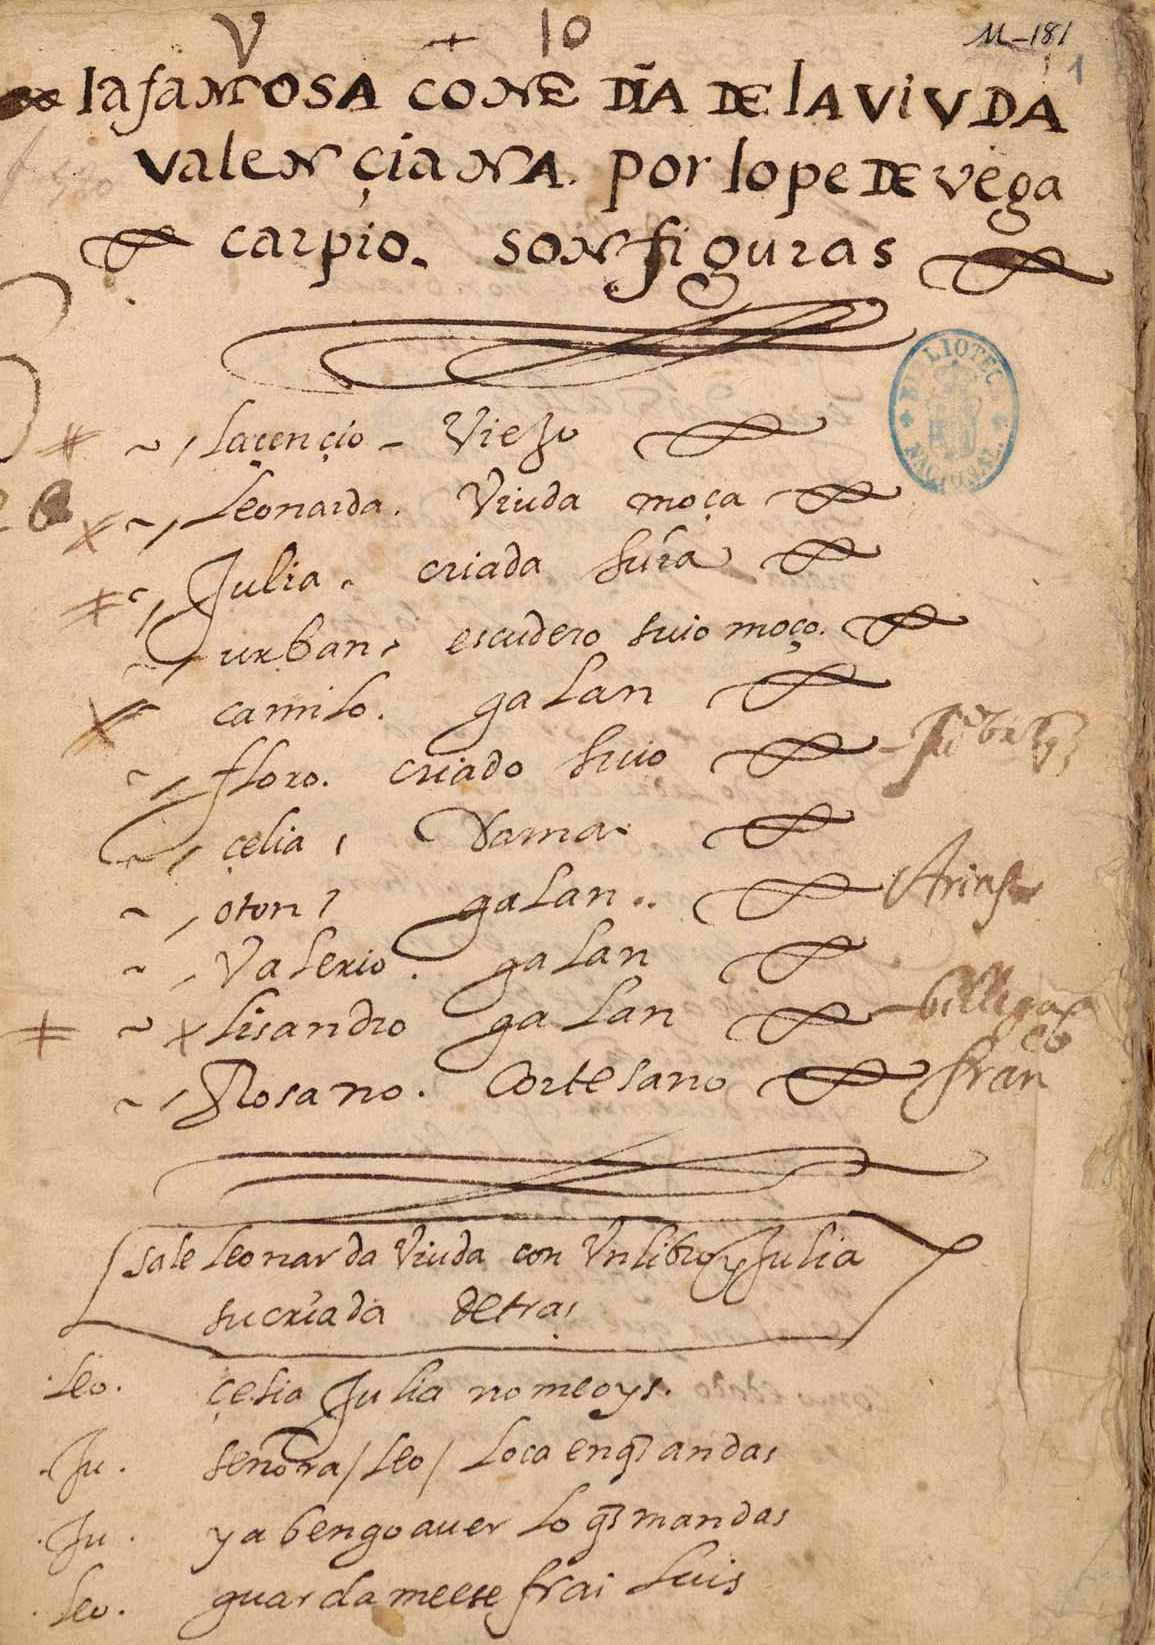 La viuda valenciana copia manuscrita.jpg